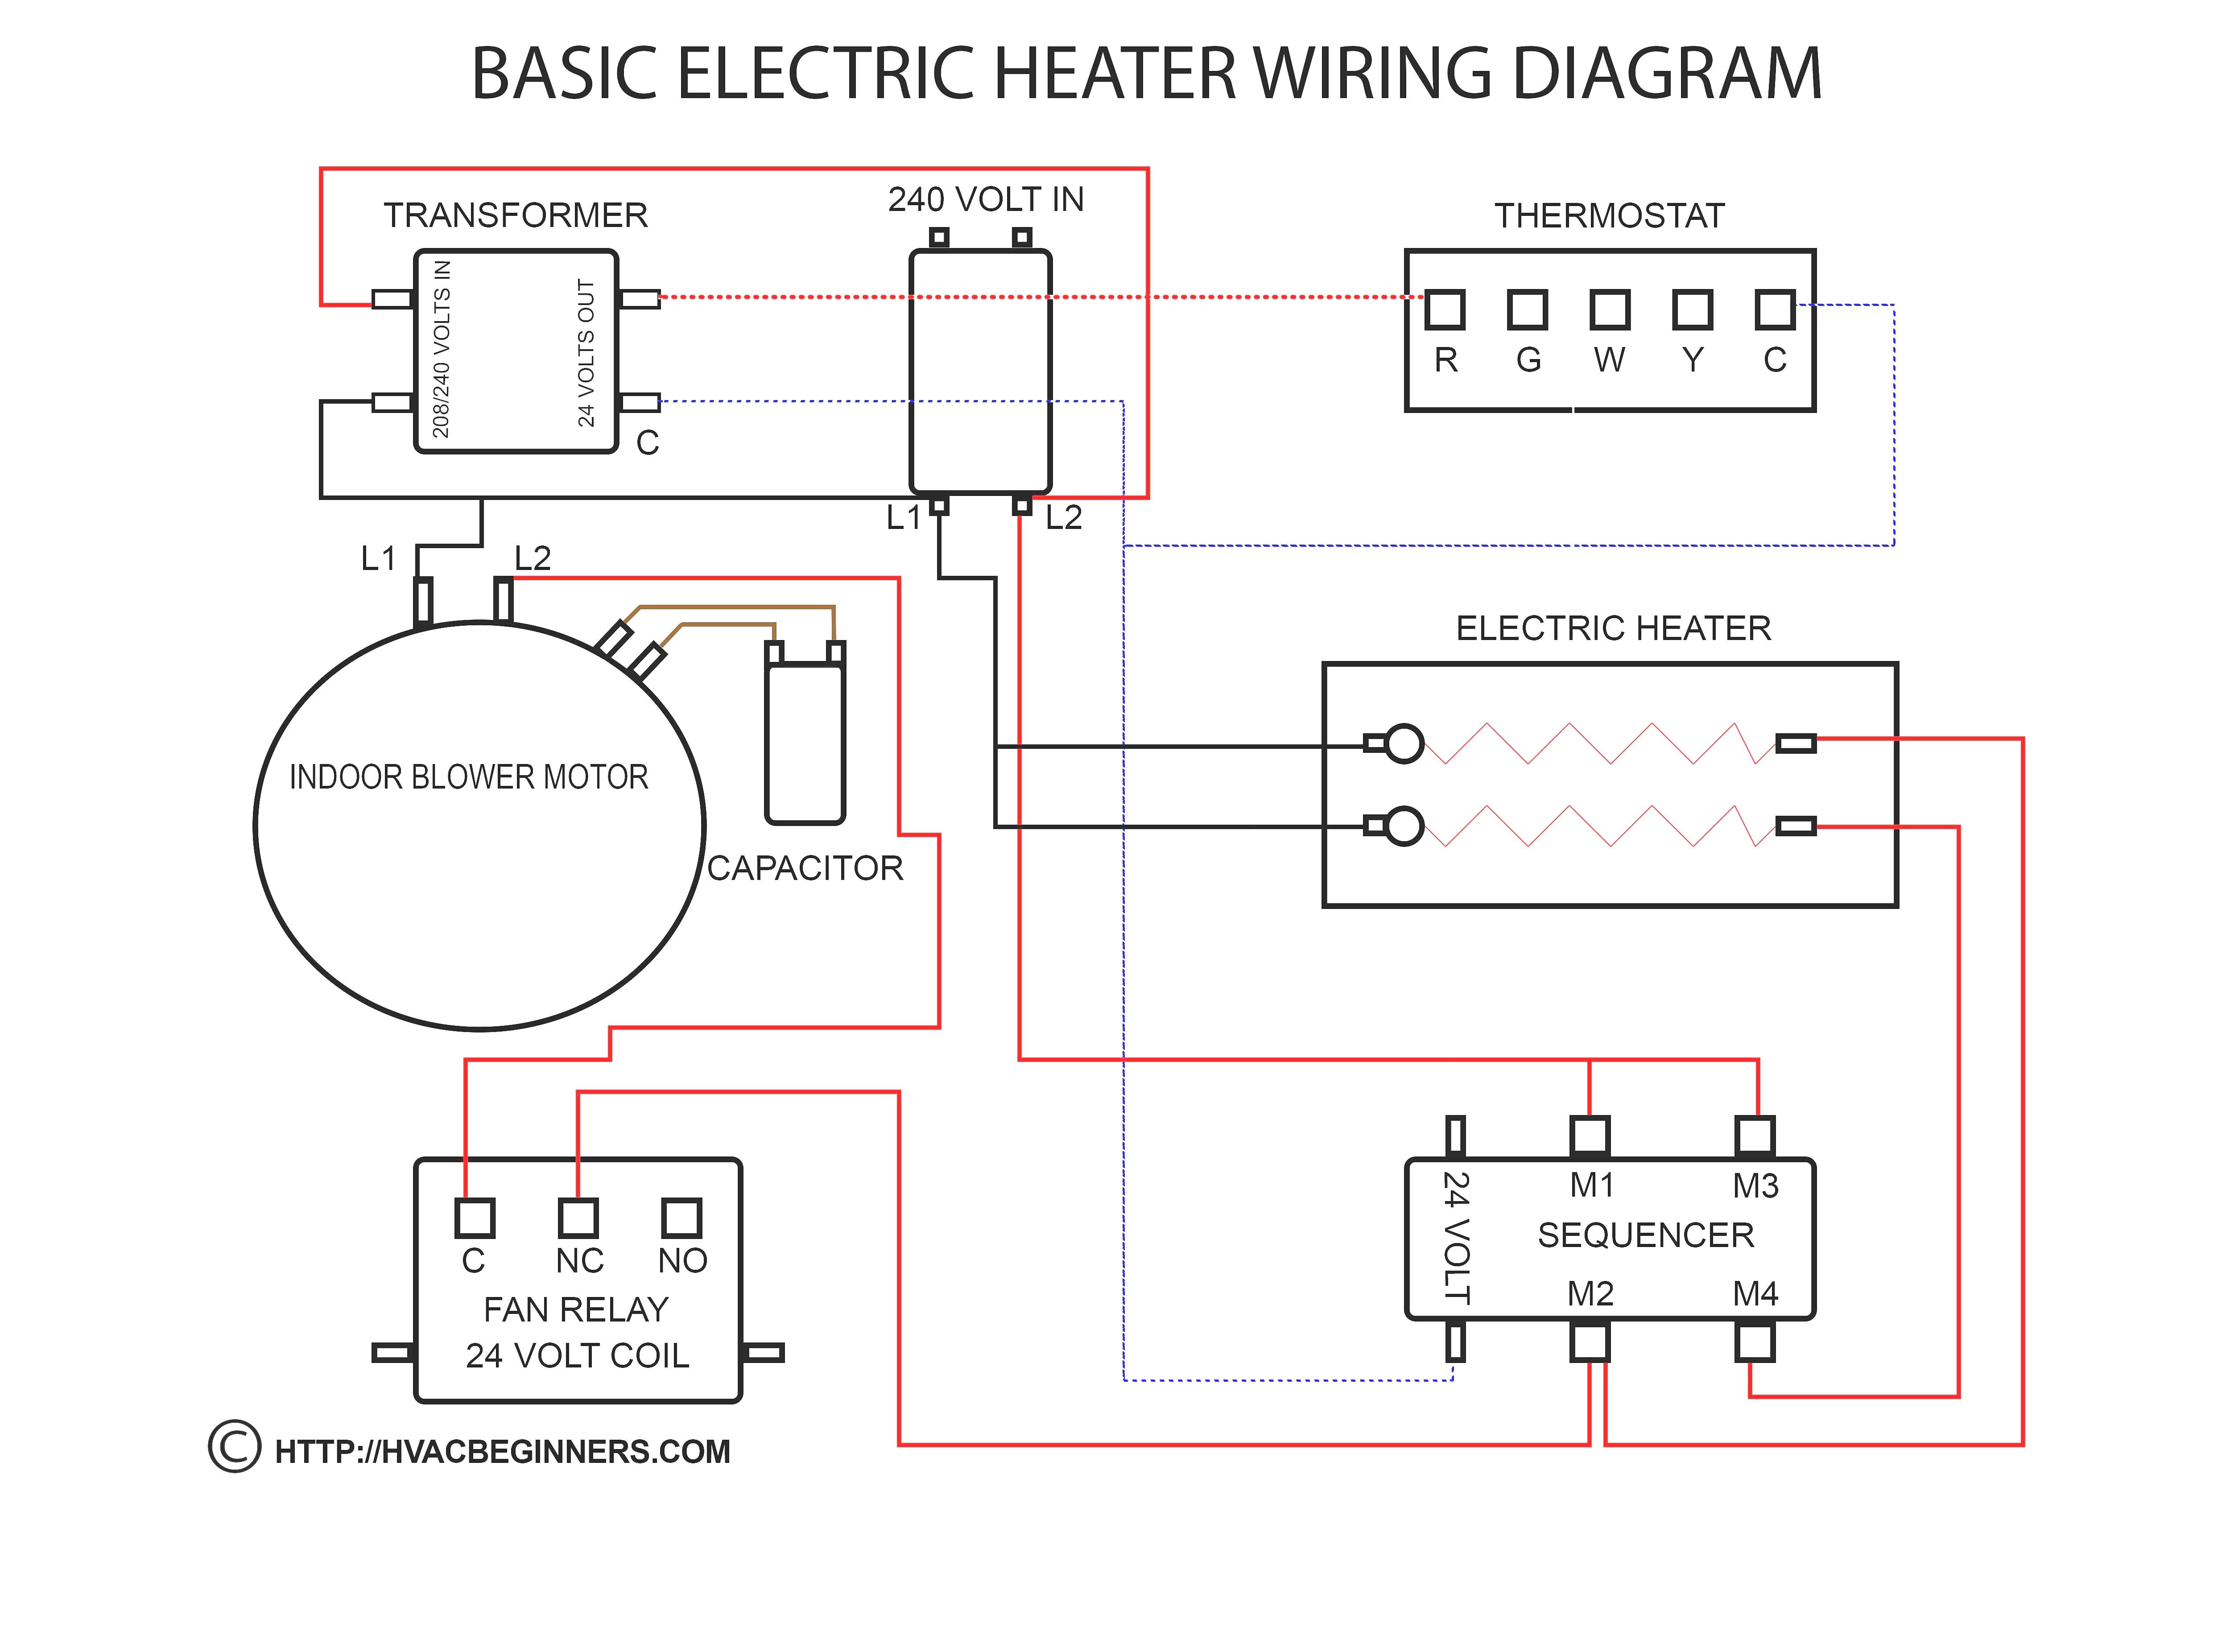 trenton wiring diagrams wiring diagram used trenton wiring diagrams